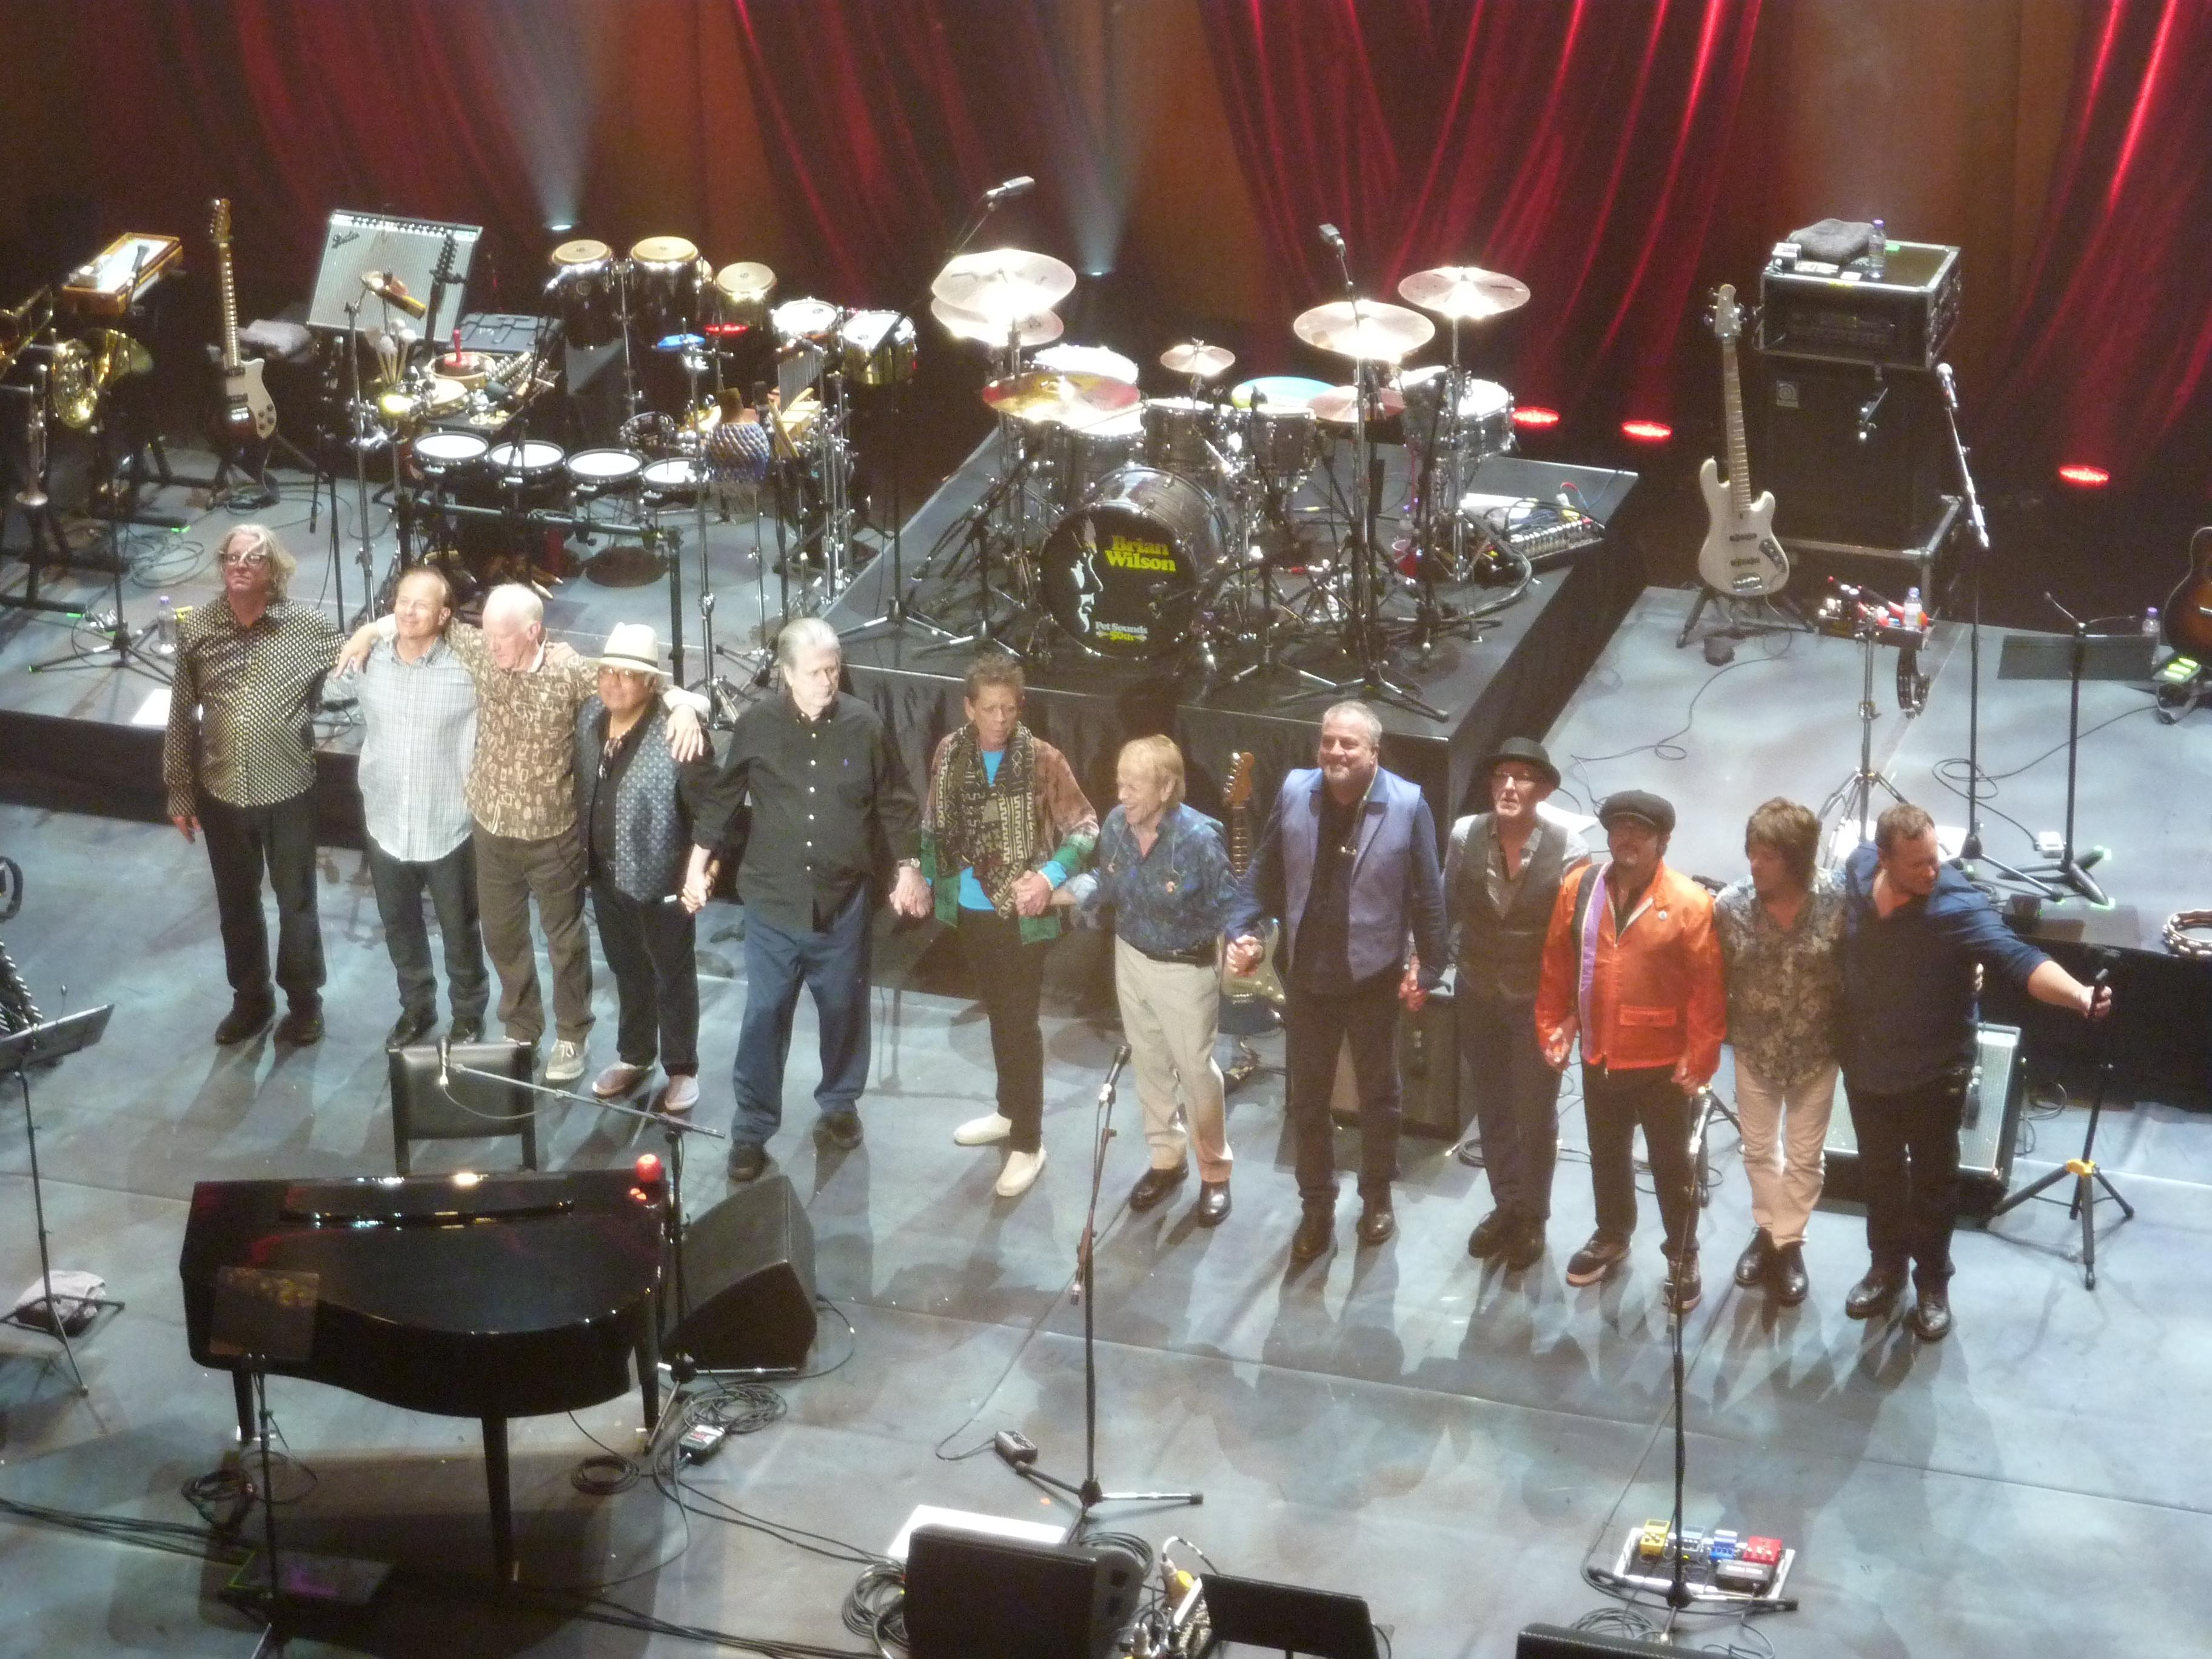 Brian Wilson, London Palladium, 20th May 2016, greetings